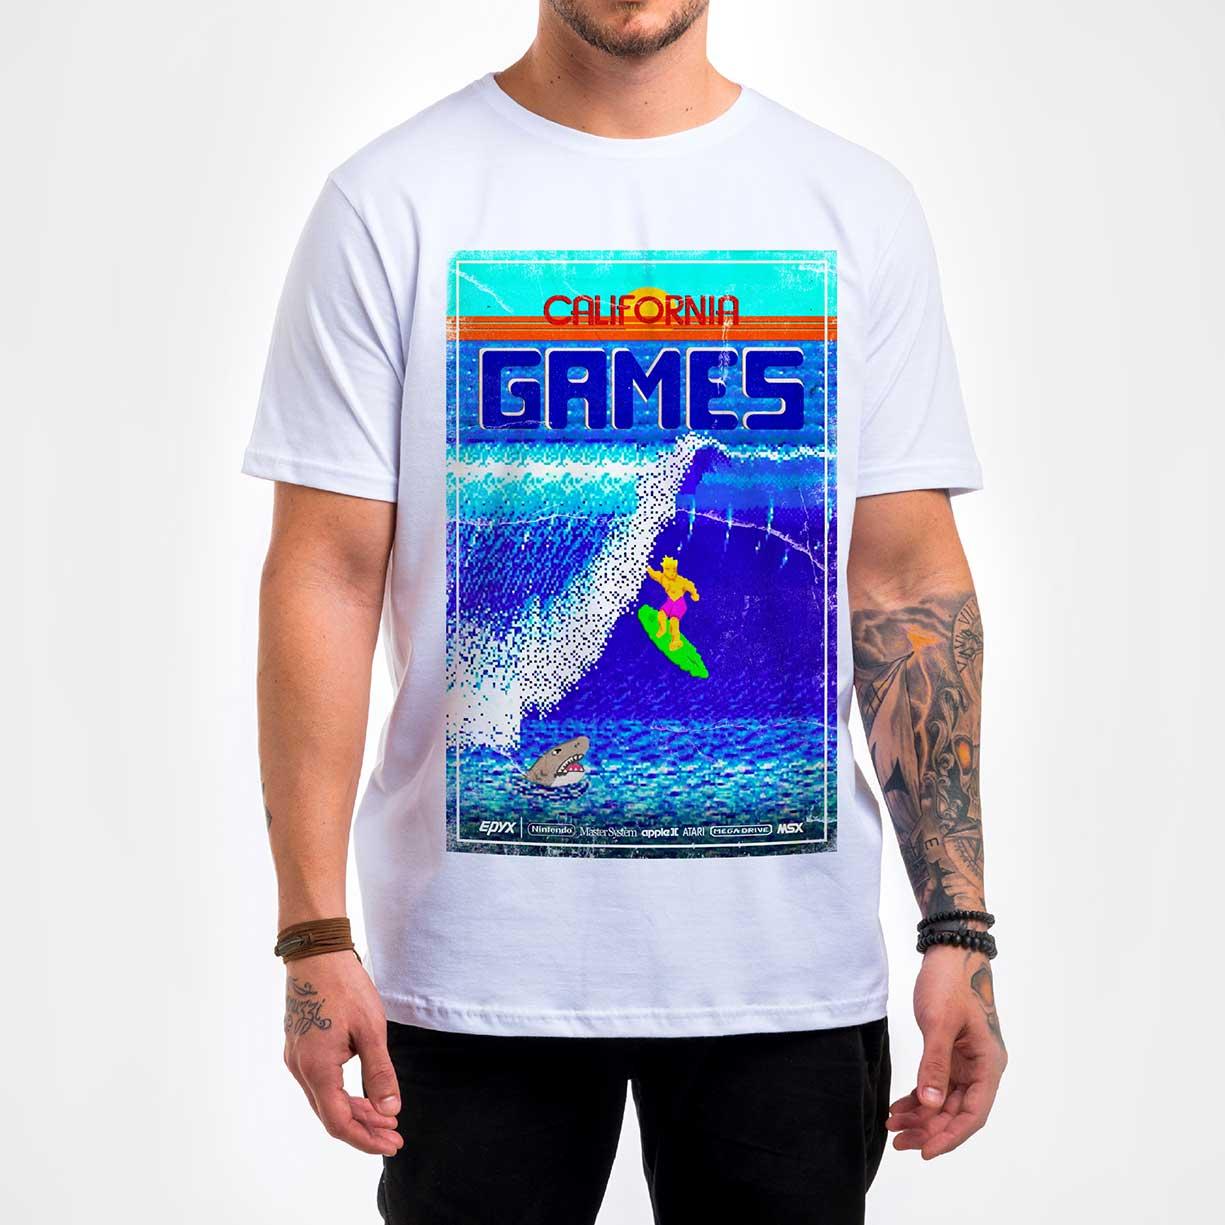 Camisa Masculina - Califórnia Games